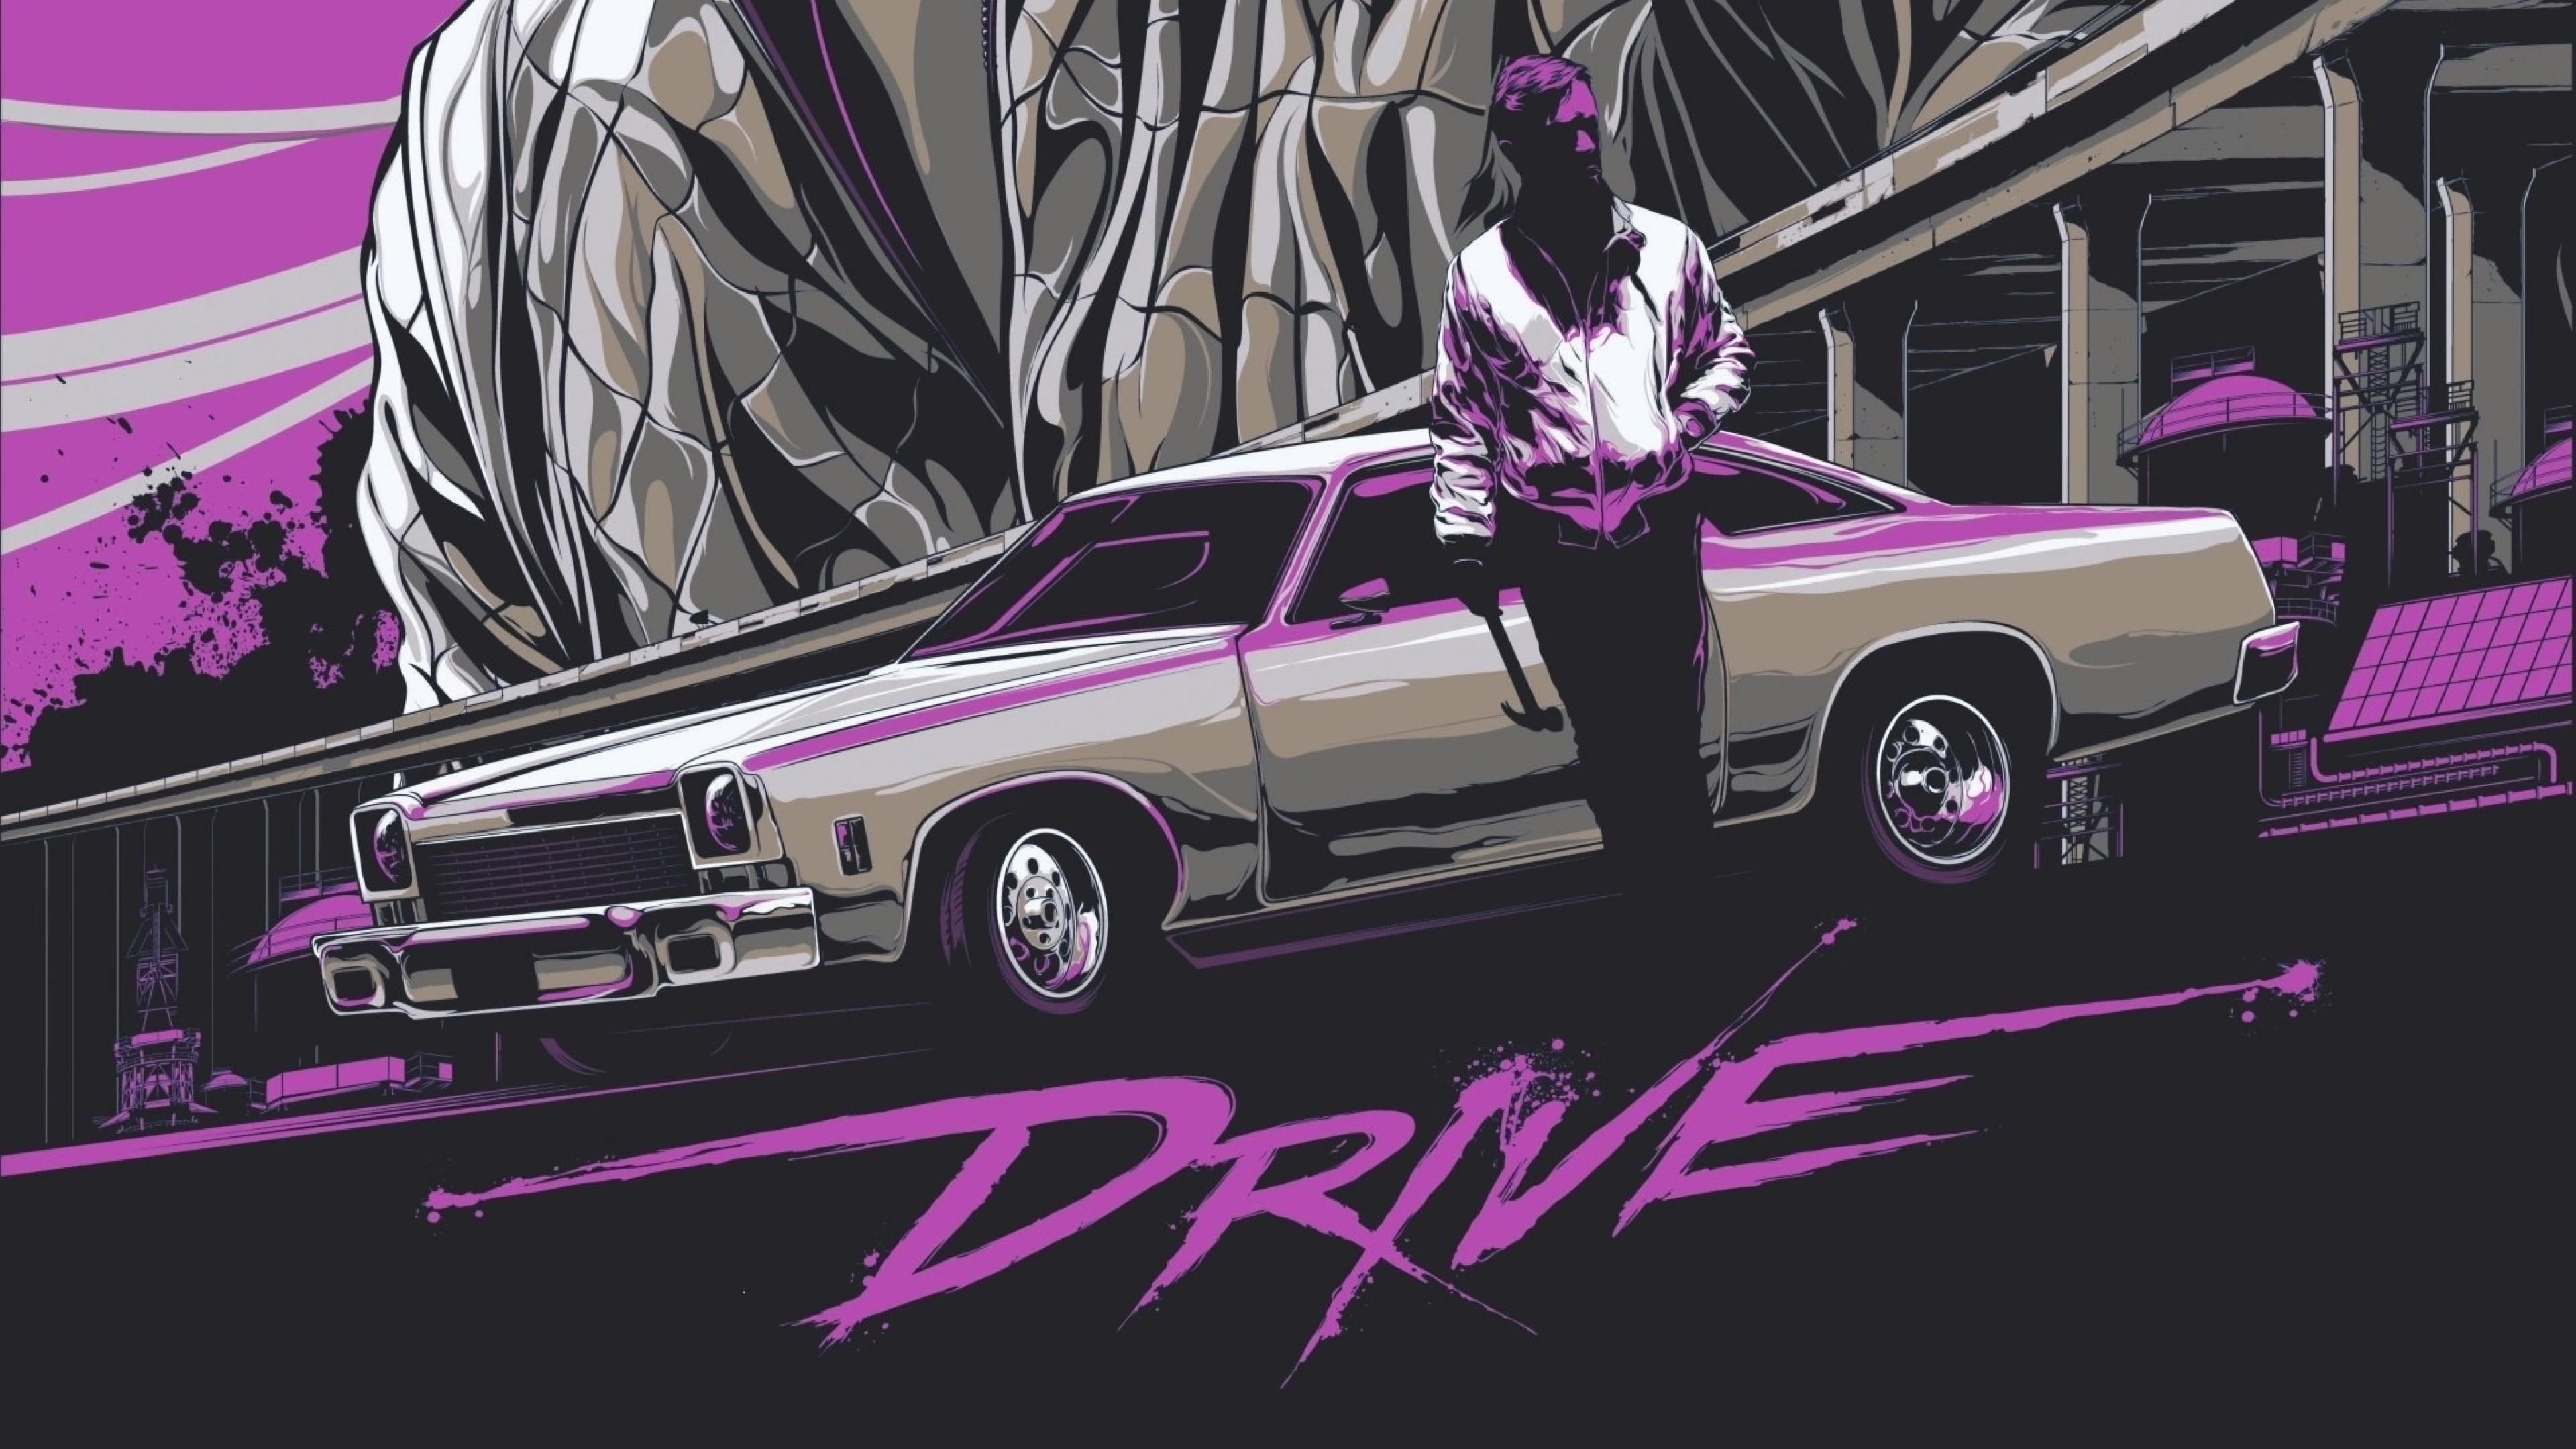 drive retrowave 4k 1551642879 - Drive Retrowave 4k - retrowave wallpapers, hd-wallpapers, digital art wallpapers, artwork wallpapers, artist wallpapers, 4k-wallpapers